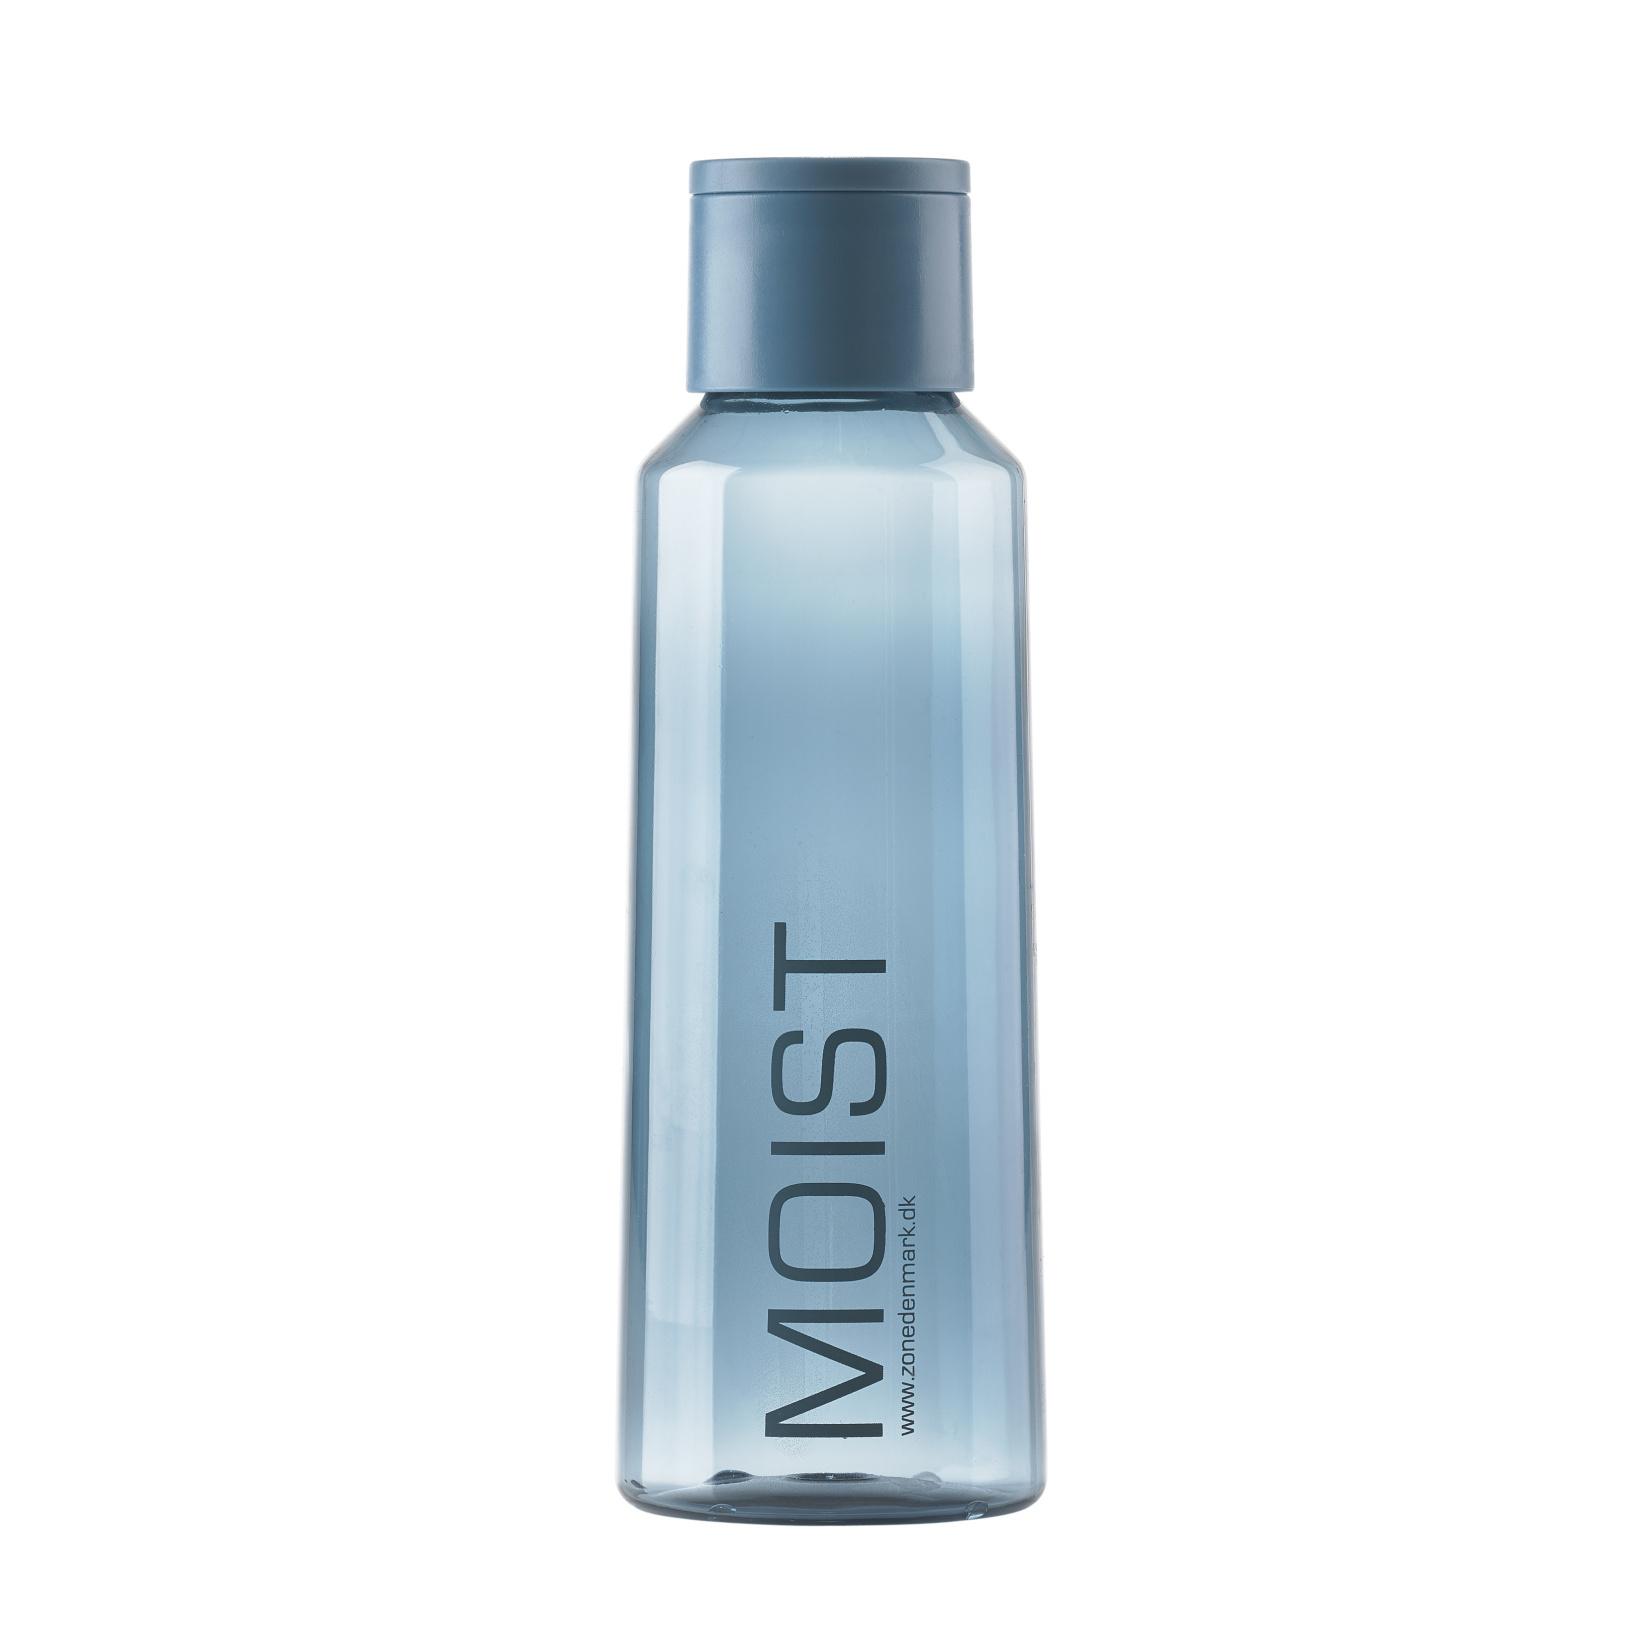 Láhev na vodu 0,5 l, Steel Blue, Moist - Zone Denmark